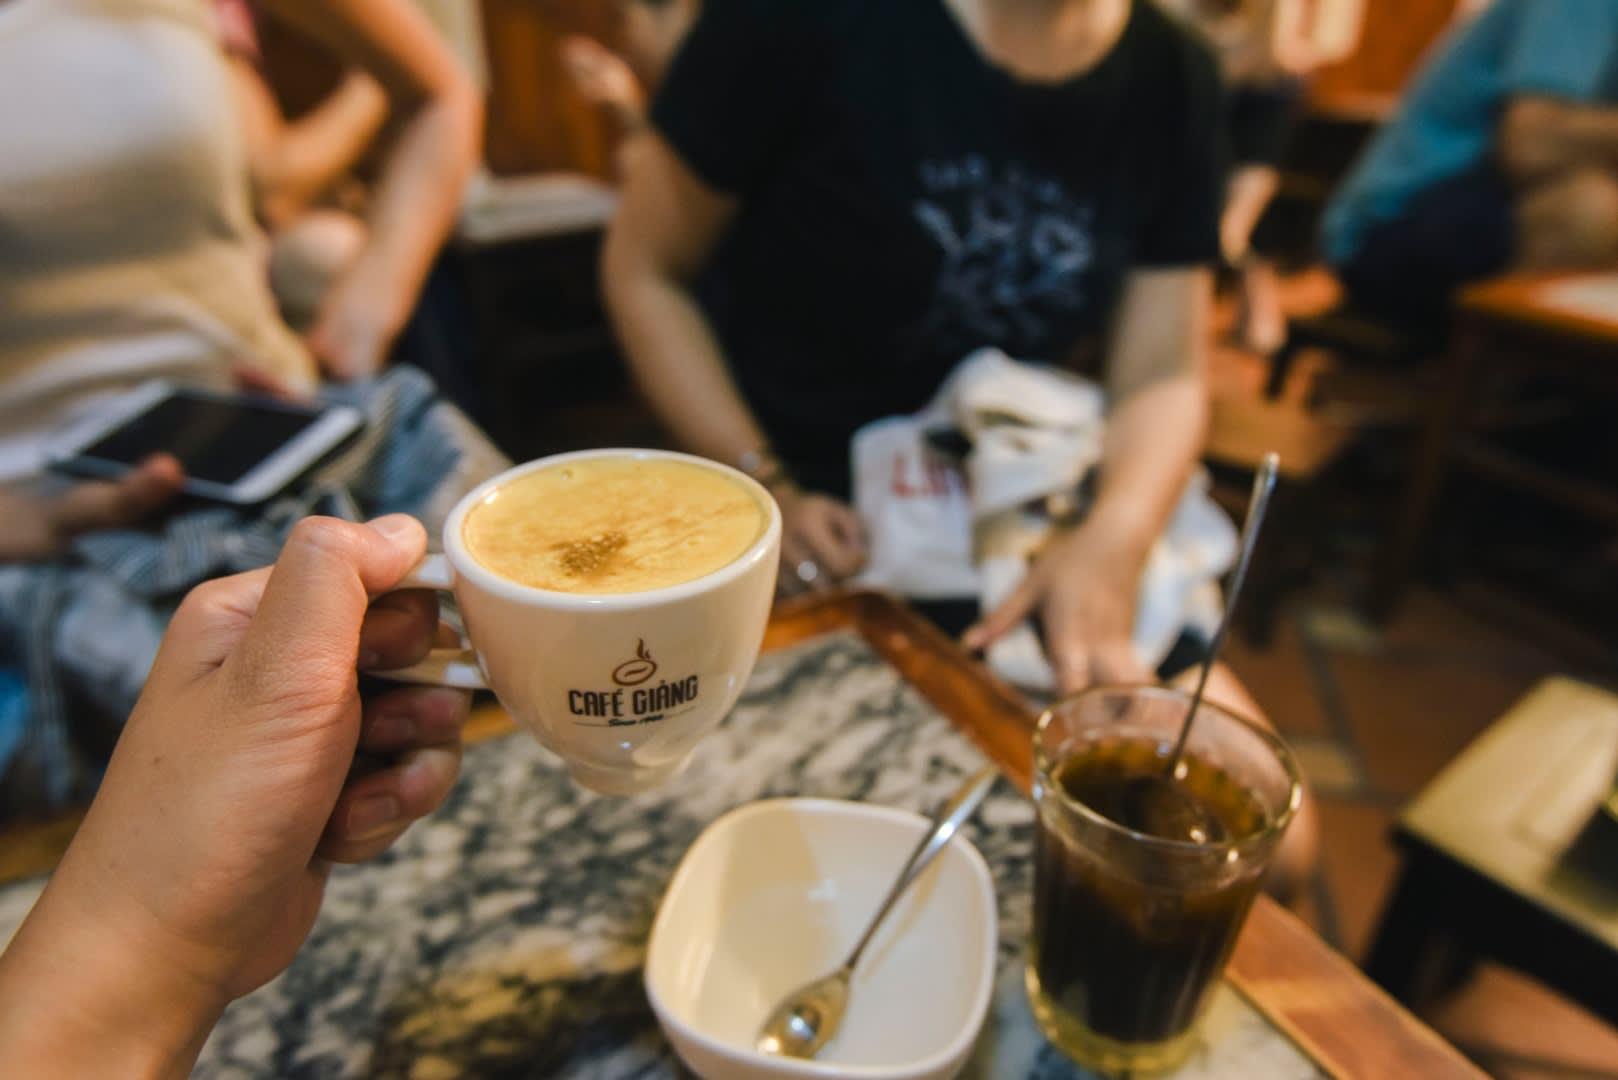 Vietnamese coffee culture